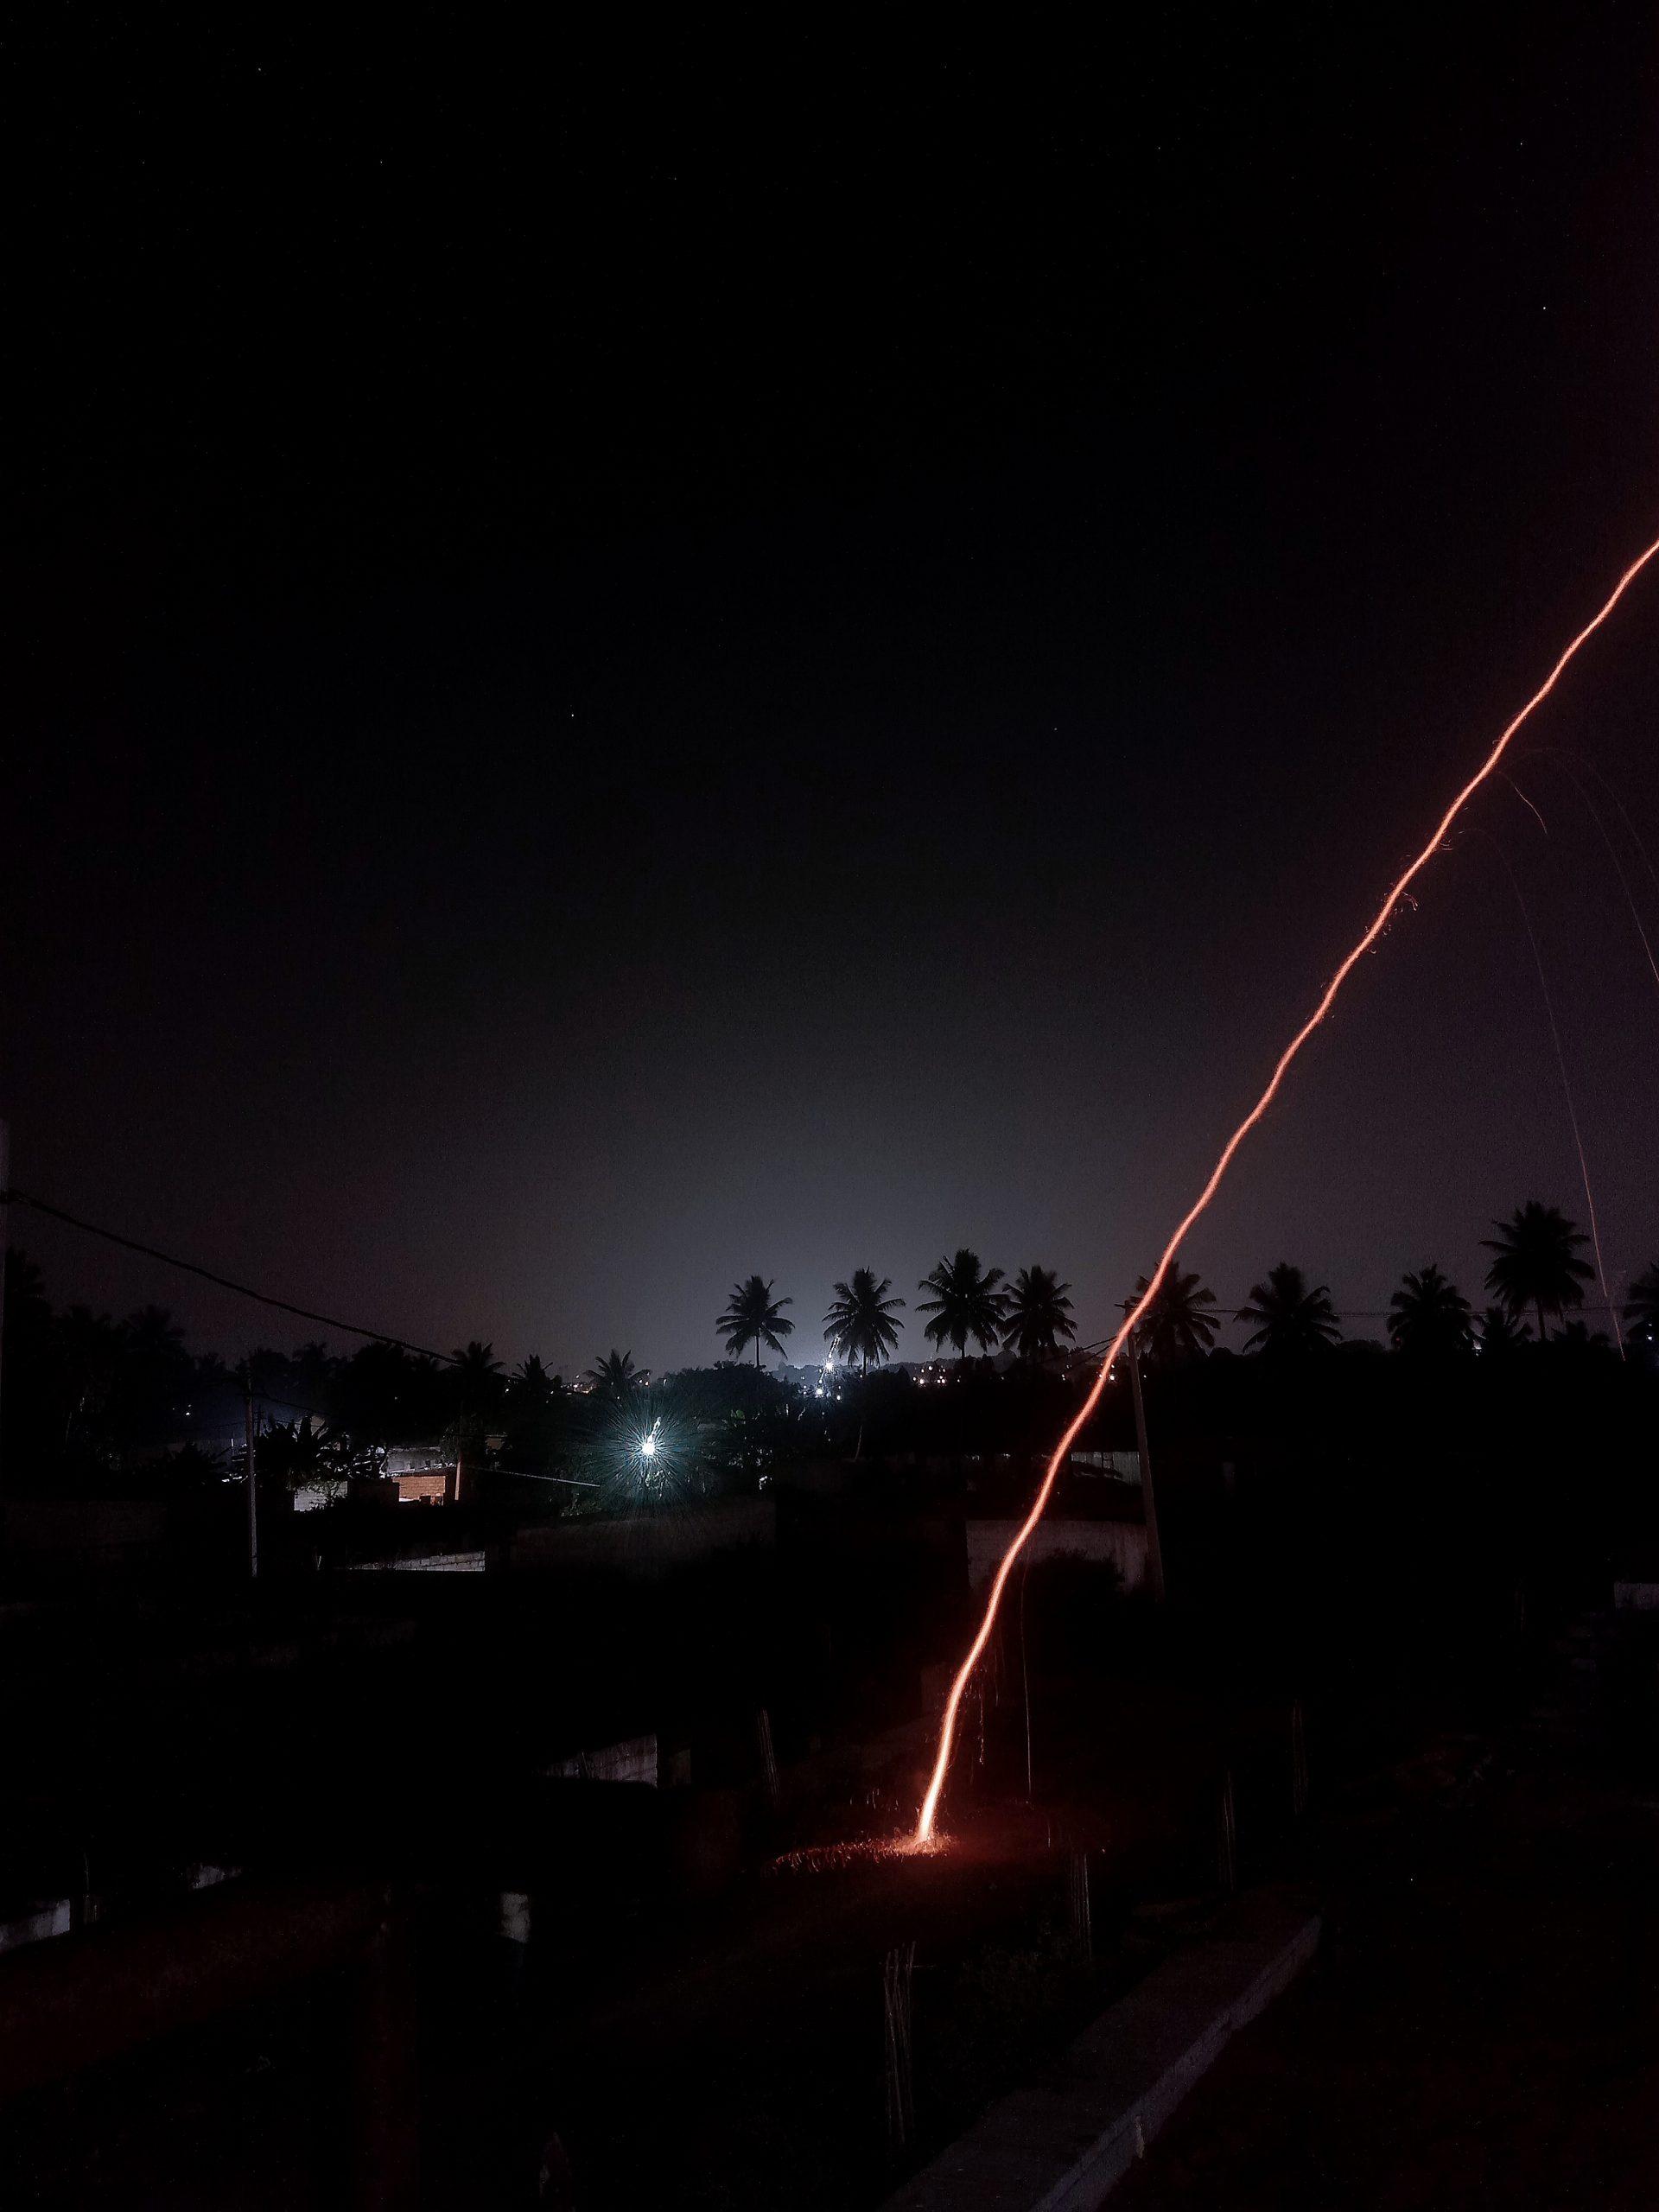 Trajectory of a rocket